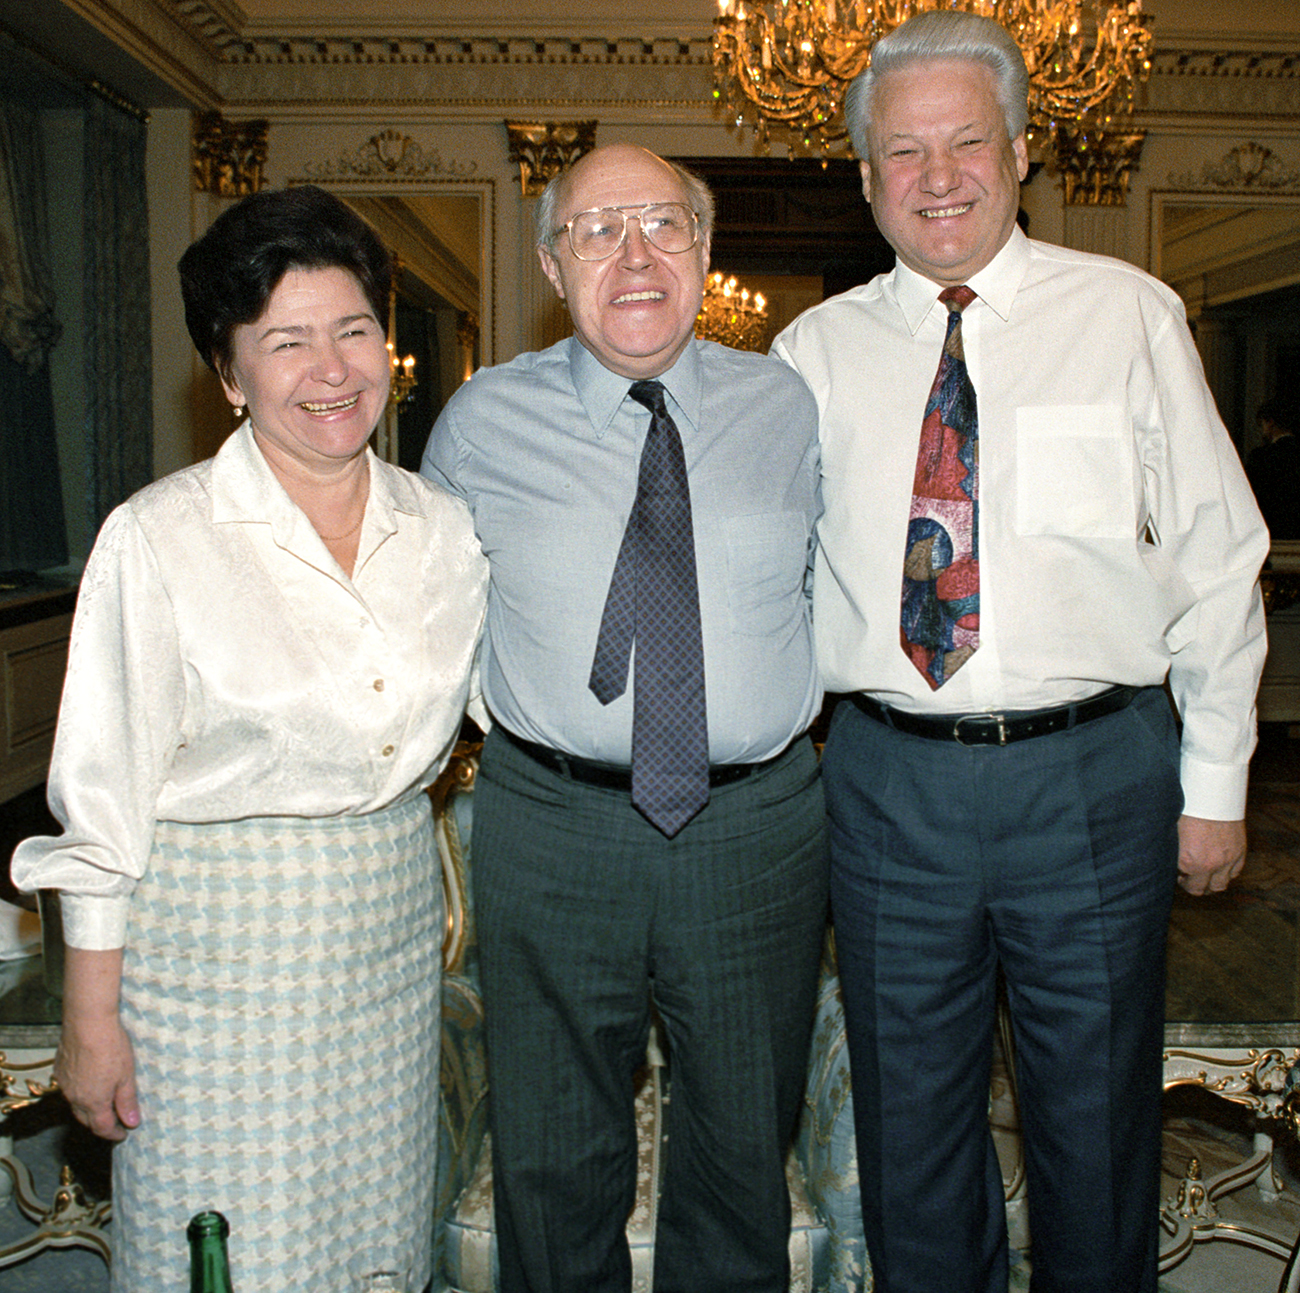 Da sinistra, Naina Eltsin, Mstislav Rostropovich eBoris Eltsin\n